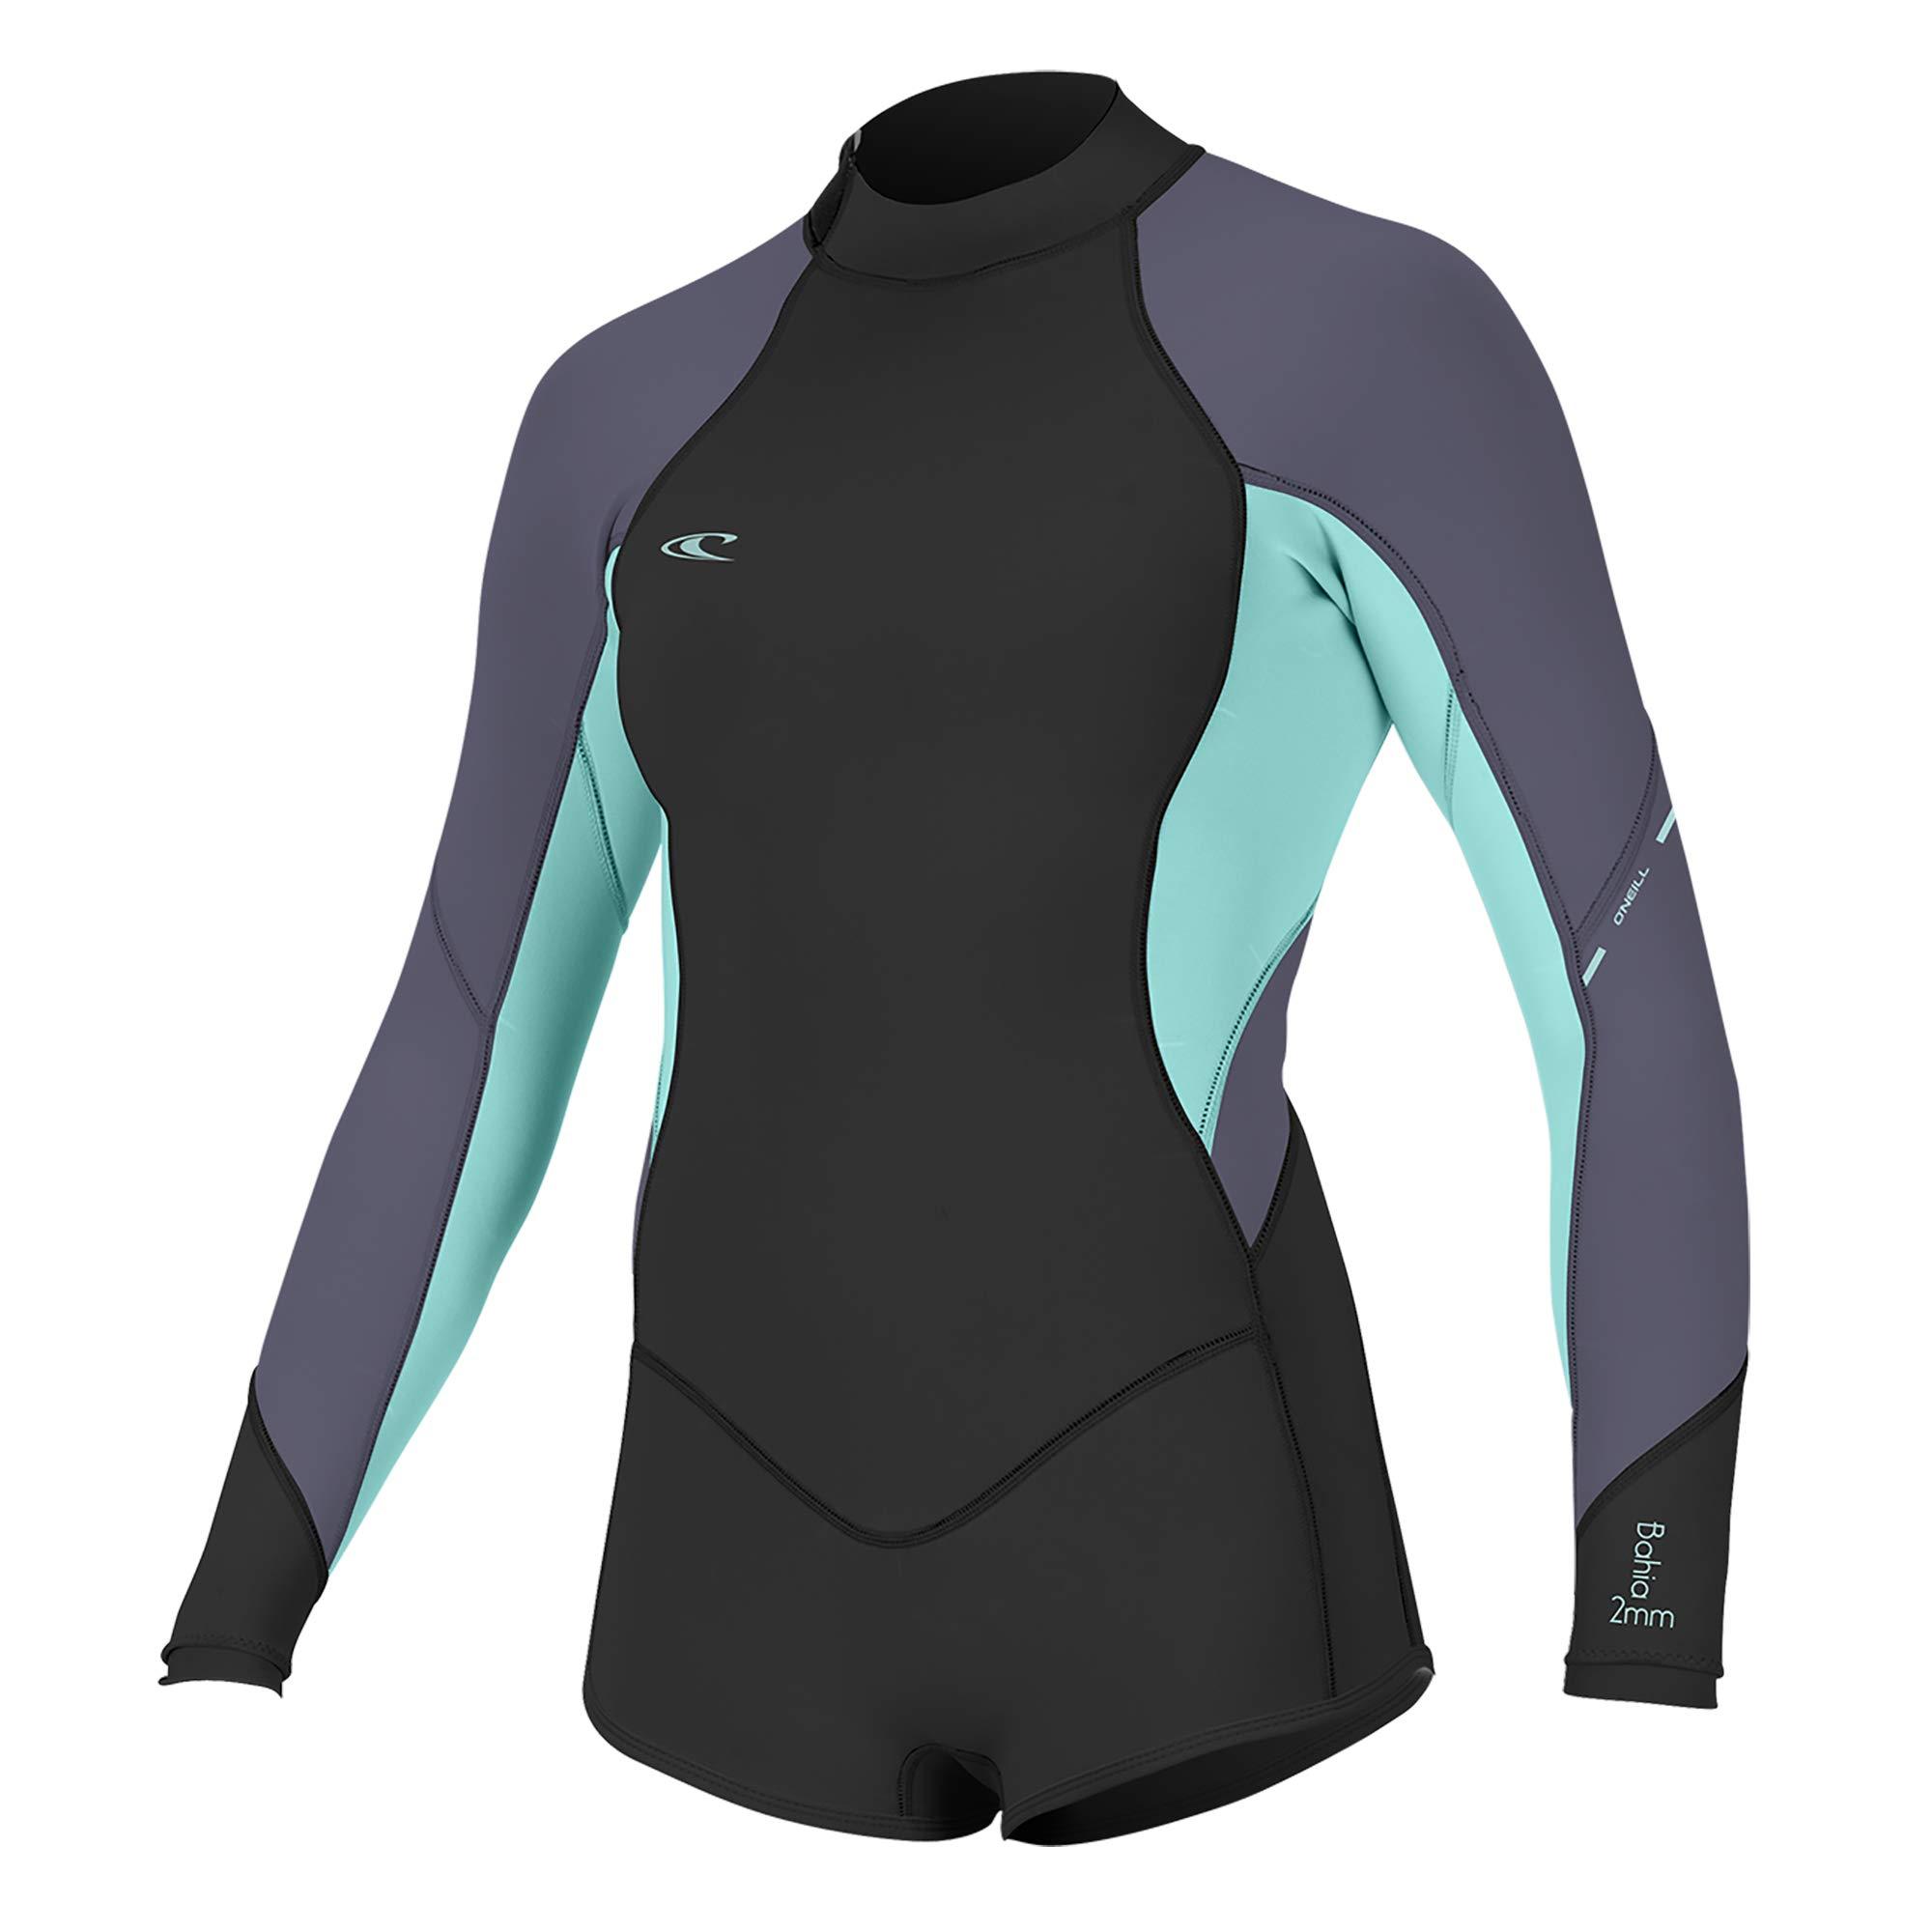 O'Neill Wetsuits Women's Bahia 2/1mm Back Zip Long Sleeve Short Spring, Black/Seaglass/Dusk, 6